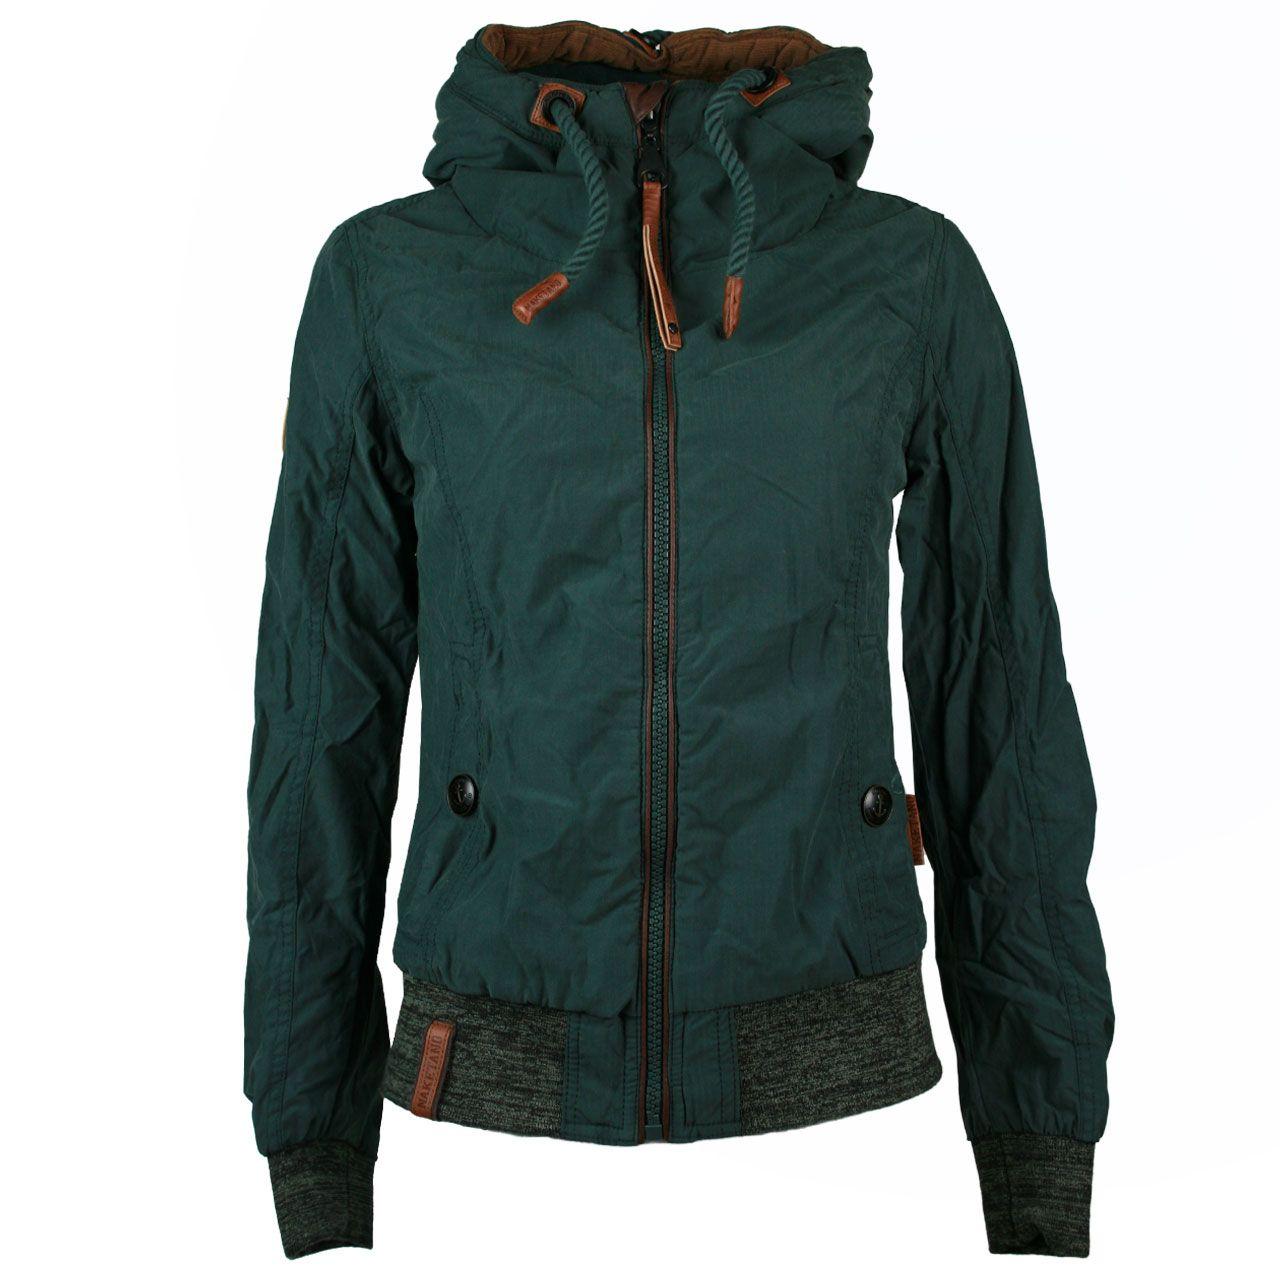 Naketano Damen Jacke / Form: Schnipp schnapp Pimmel ab / Farbe: petrol -  FarbNr